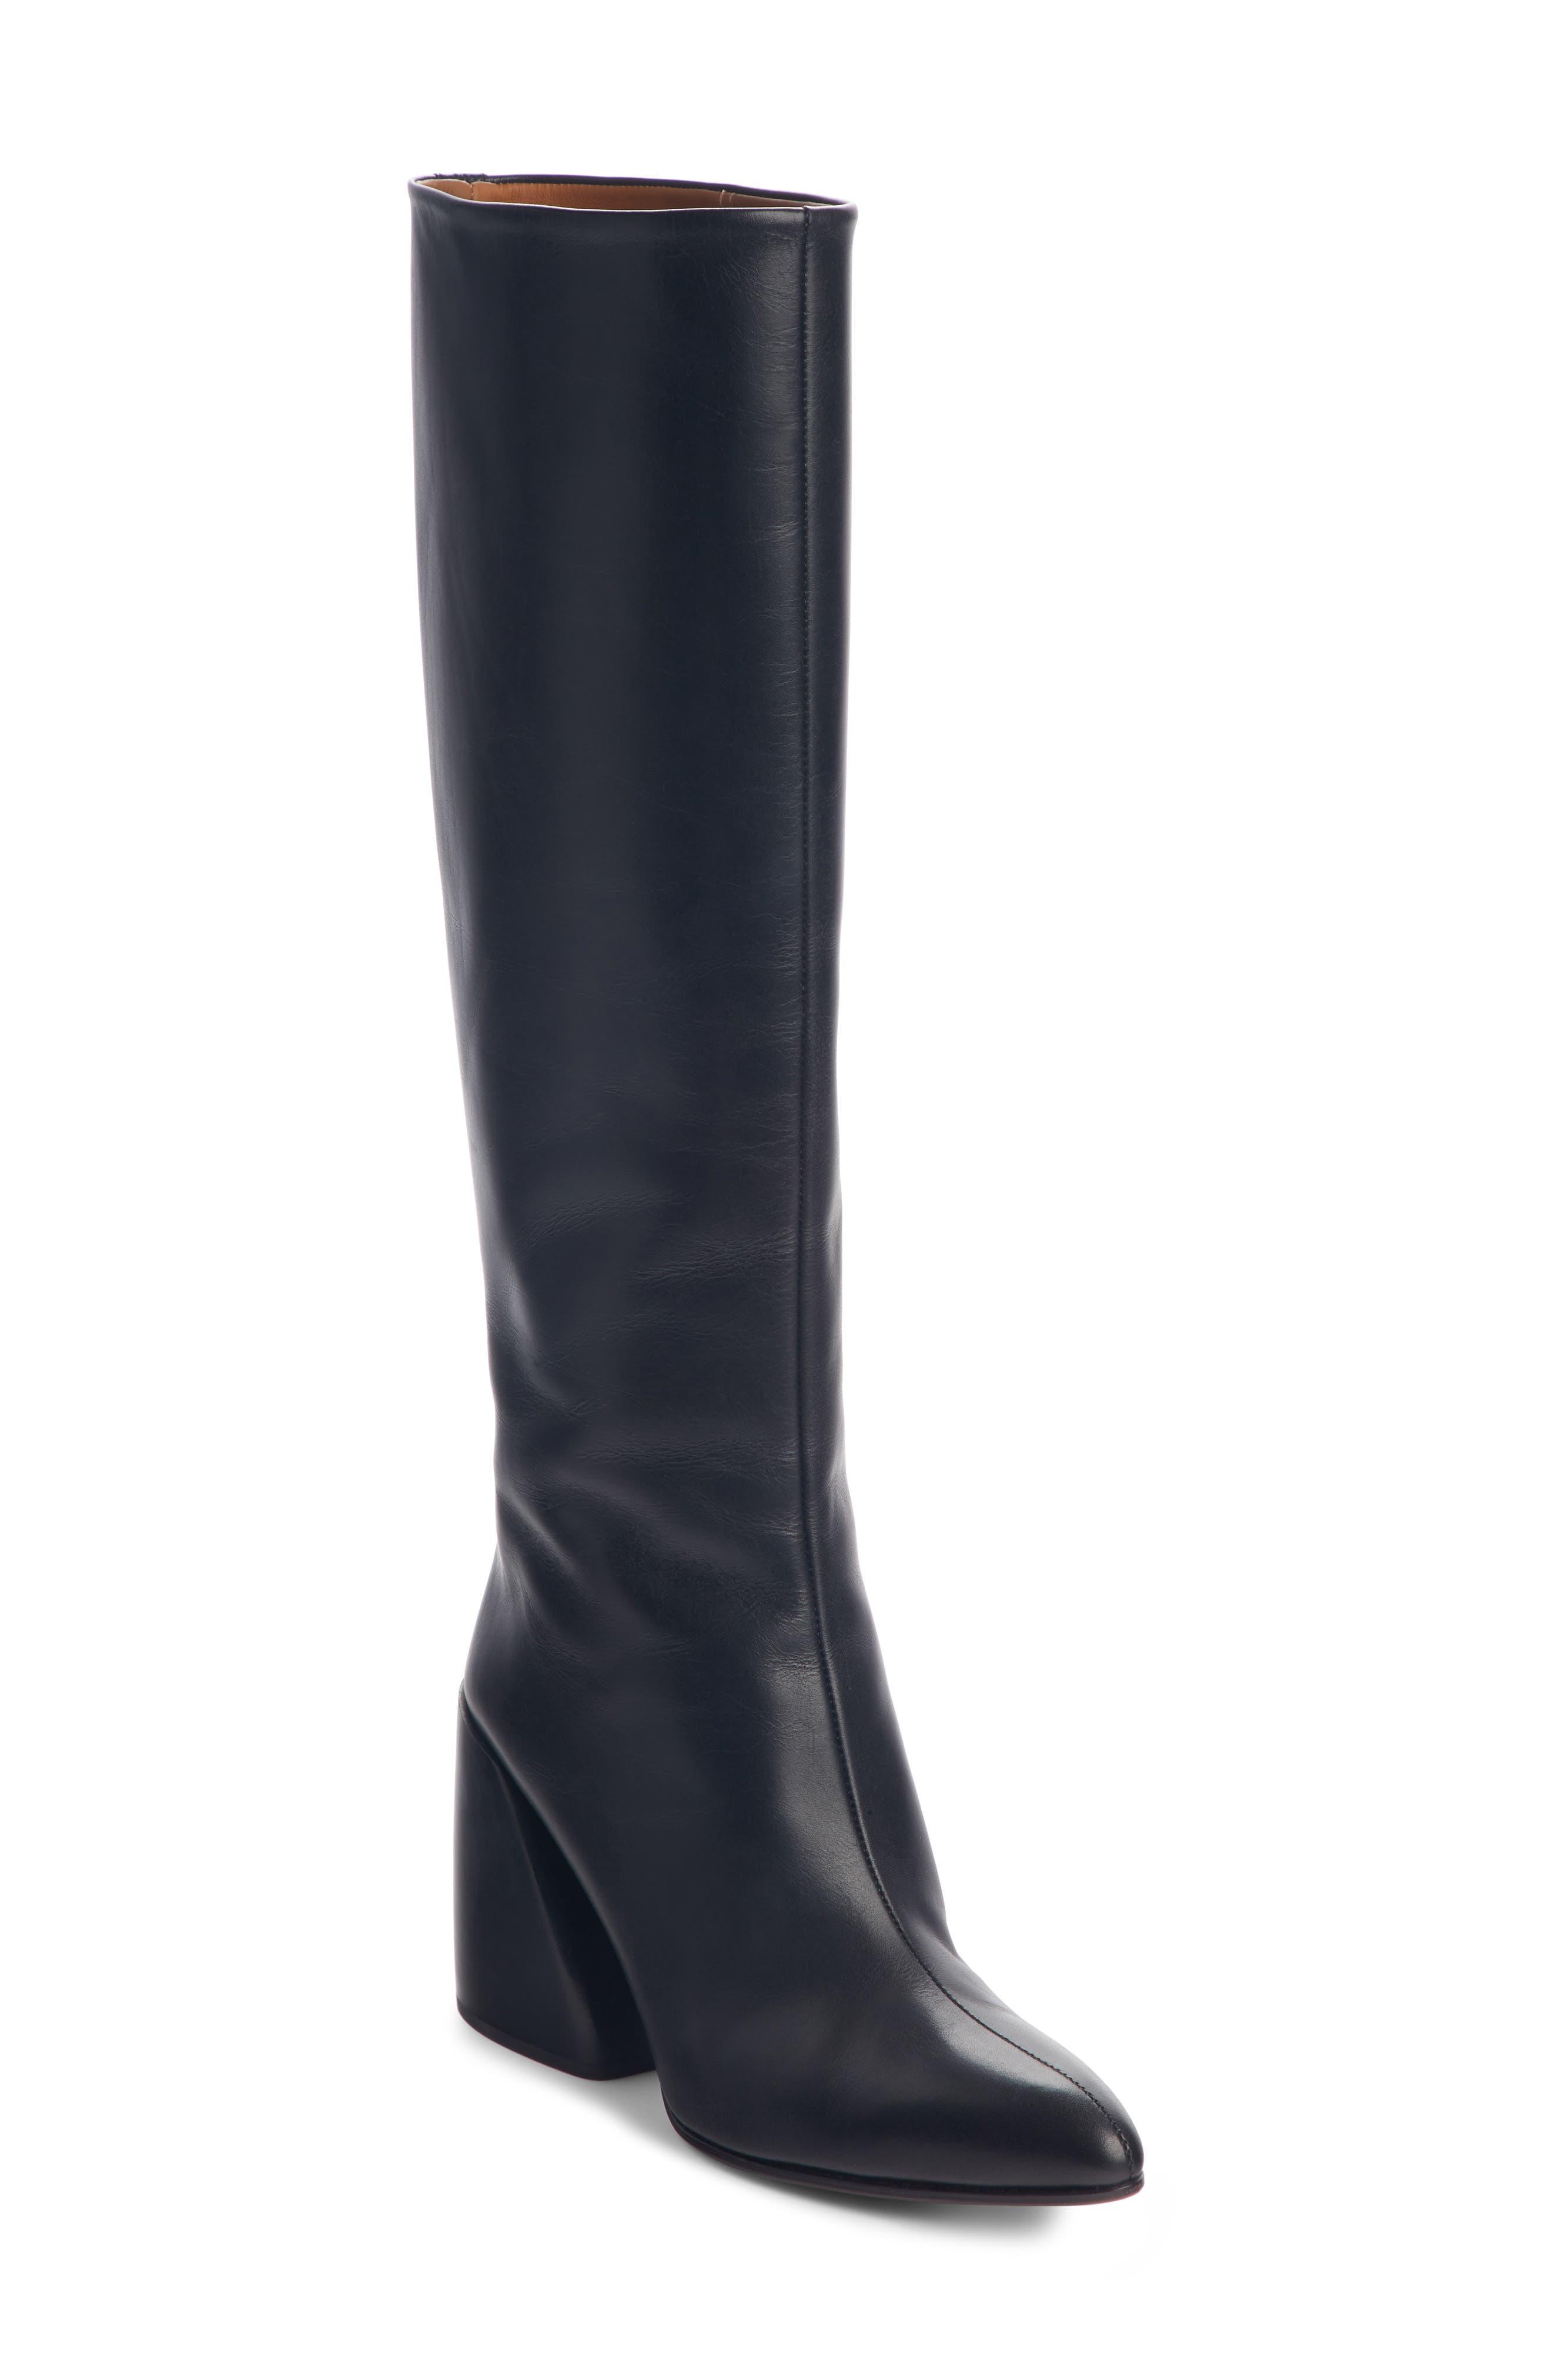 Chloe Wave Knee High Boot, Black